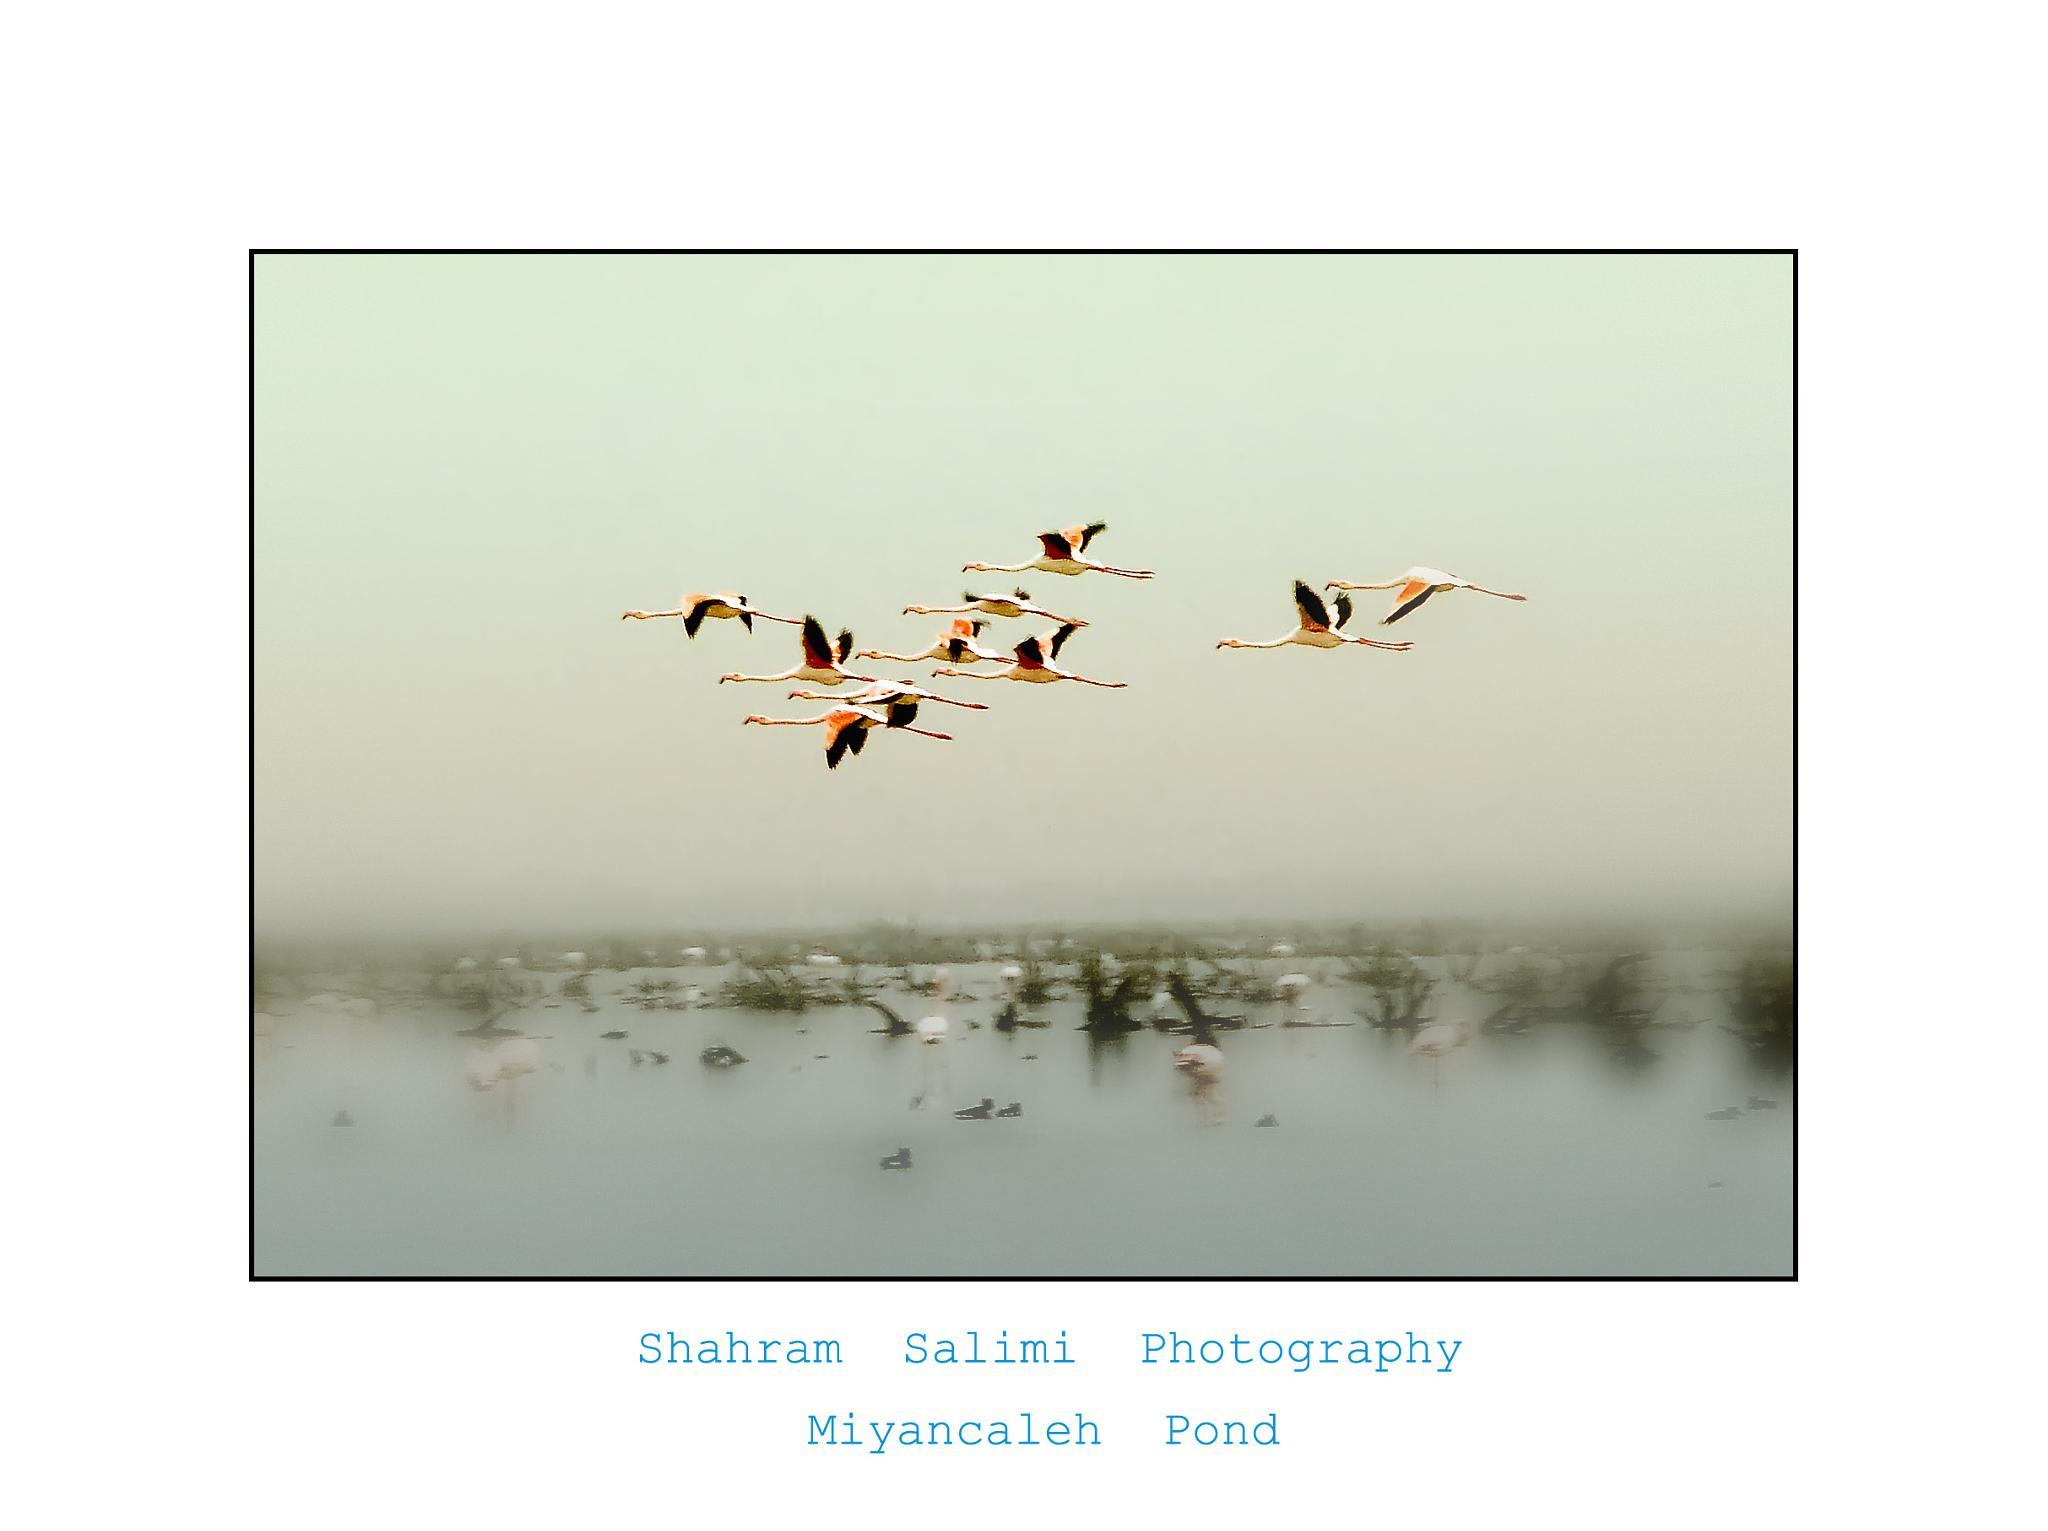 Migration by Shahram Salimi